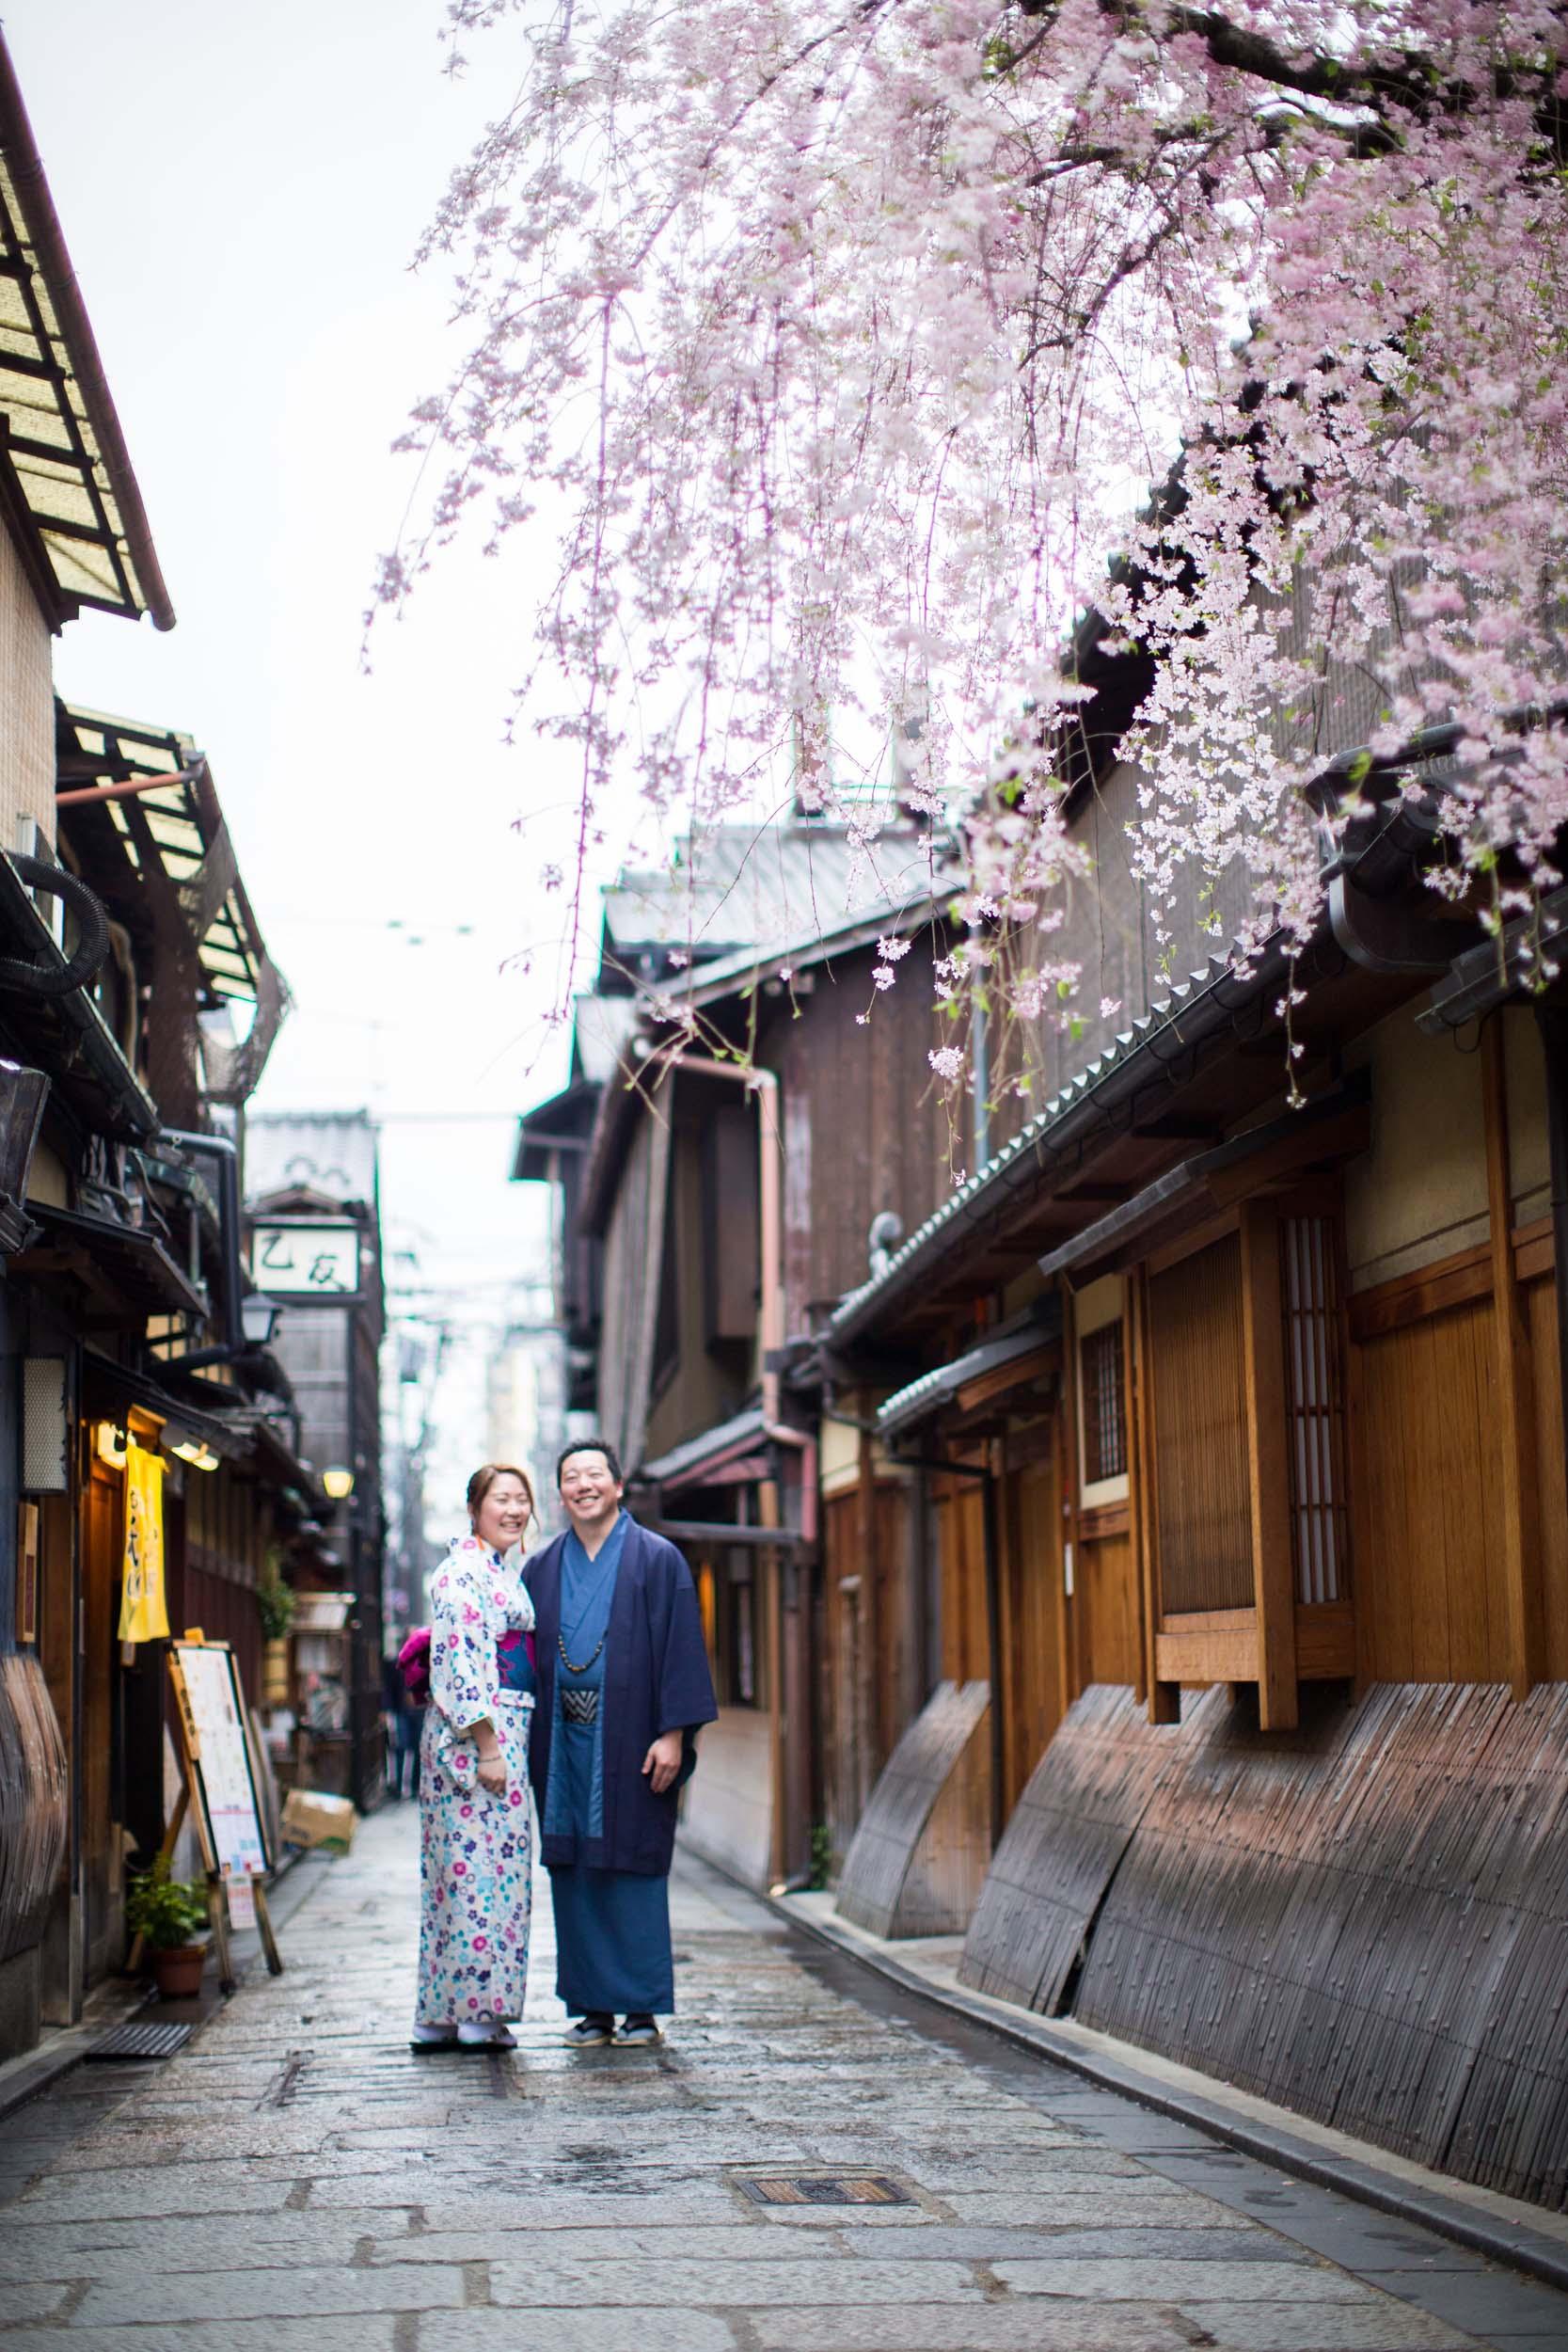 50 Photos of Japan to Inspire Your Next Escape - Blog | Hire a